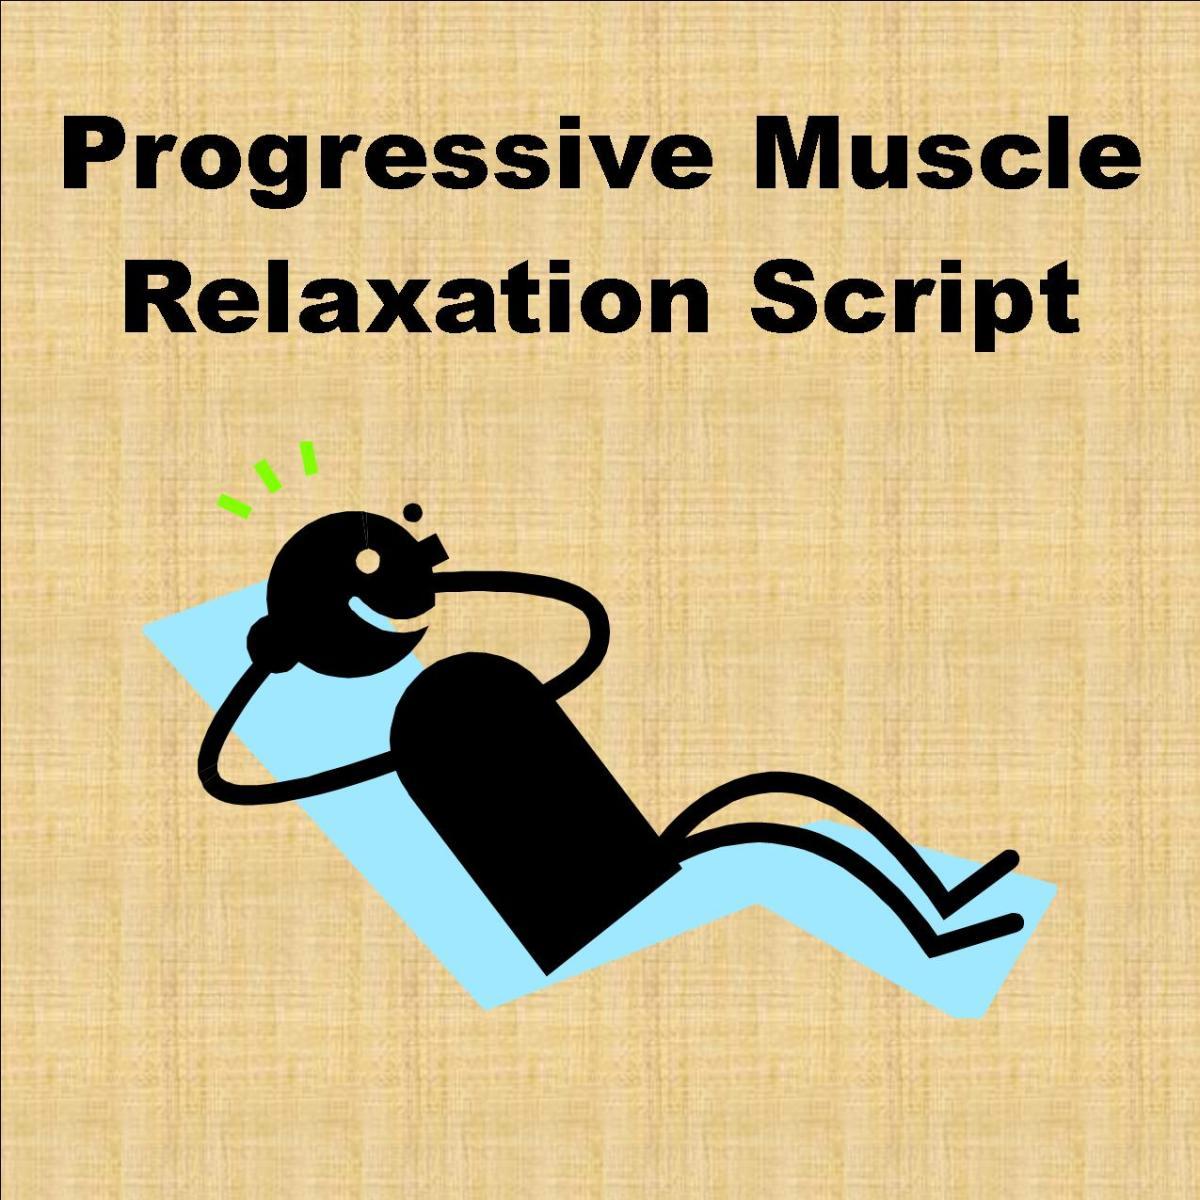 Progressive Muscle Relaxation Script